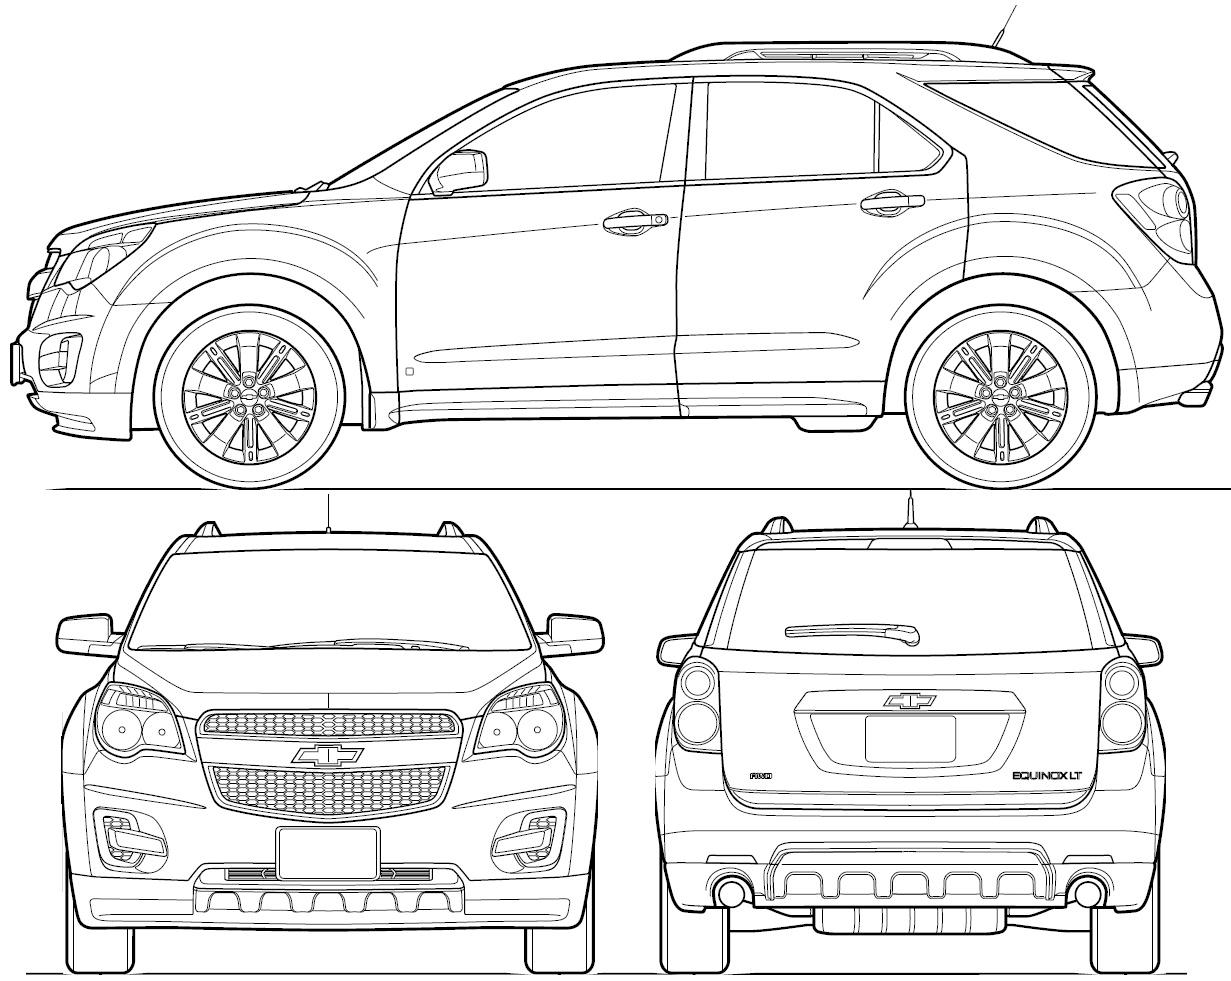 Chevrolet Equinox Suv Blueprints Free